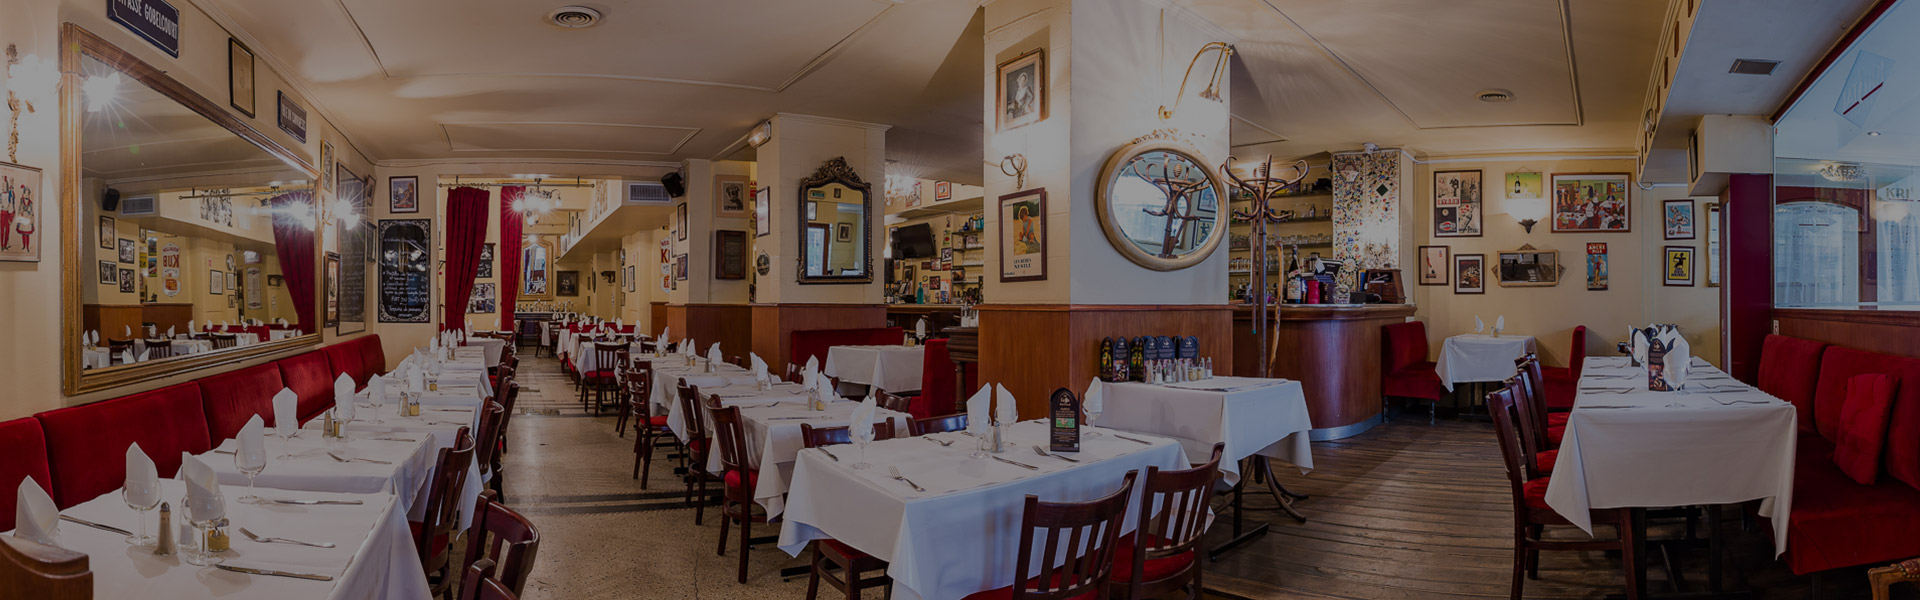 Slider-kristal-palace-salle-restaurant-cadre-convivial